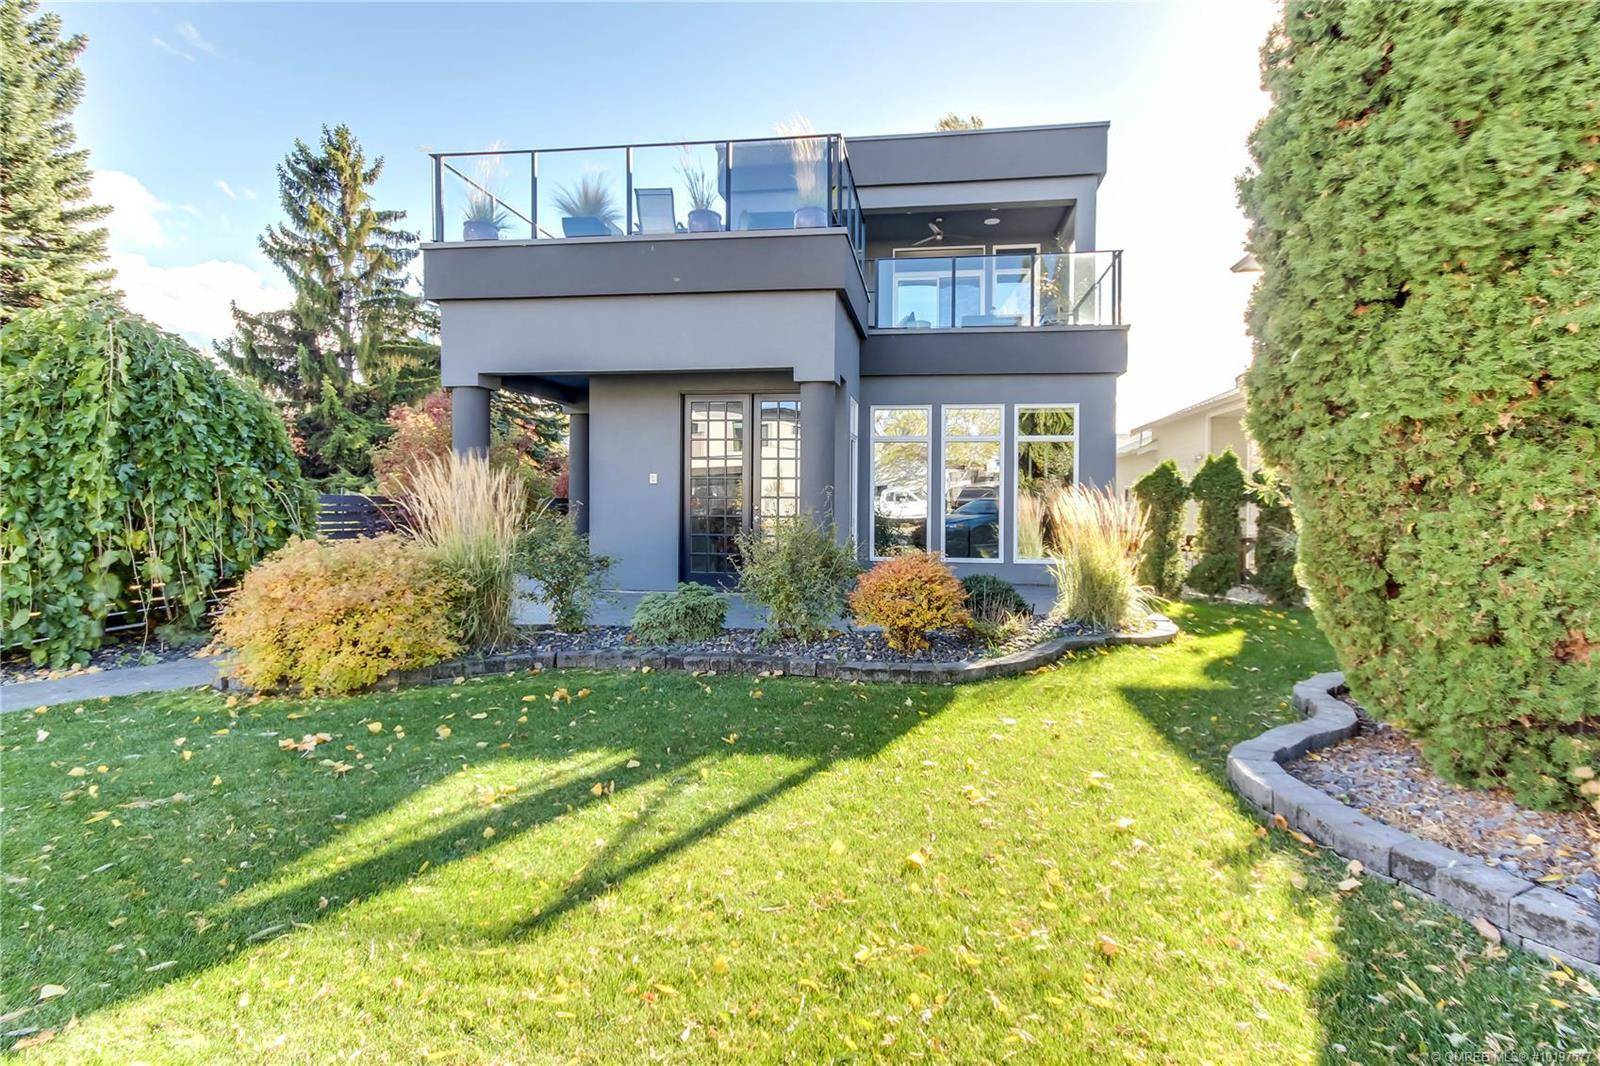 House for sale at 839 Manhattan Dr Kelowna British Columbia - MLS: 10197577